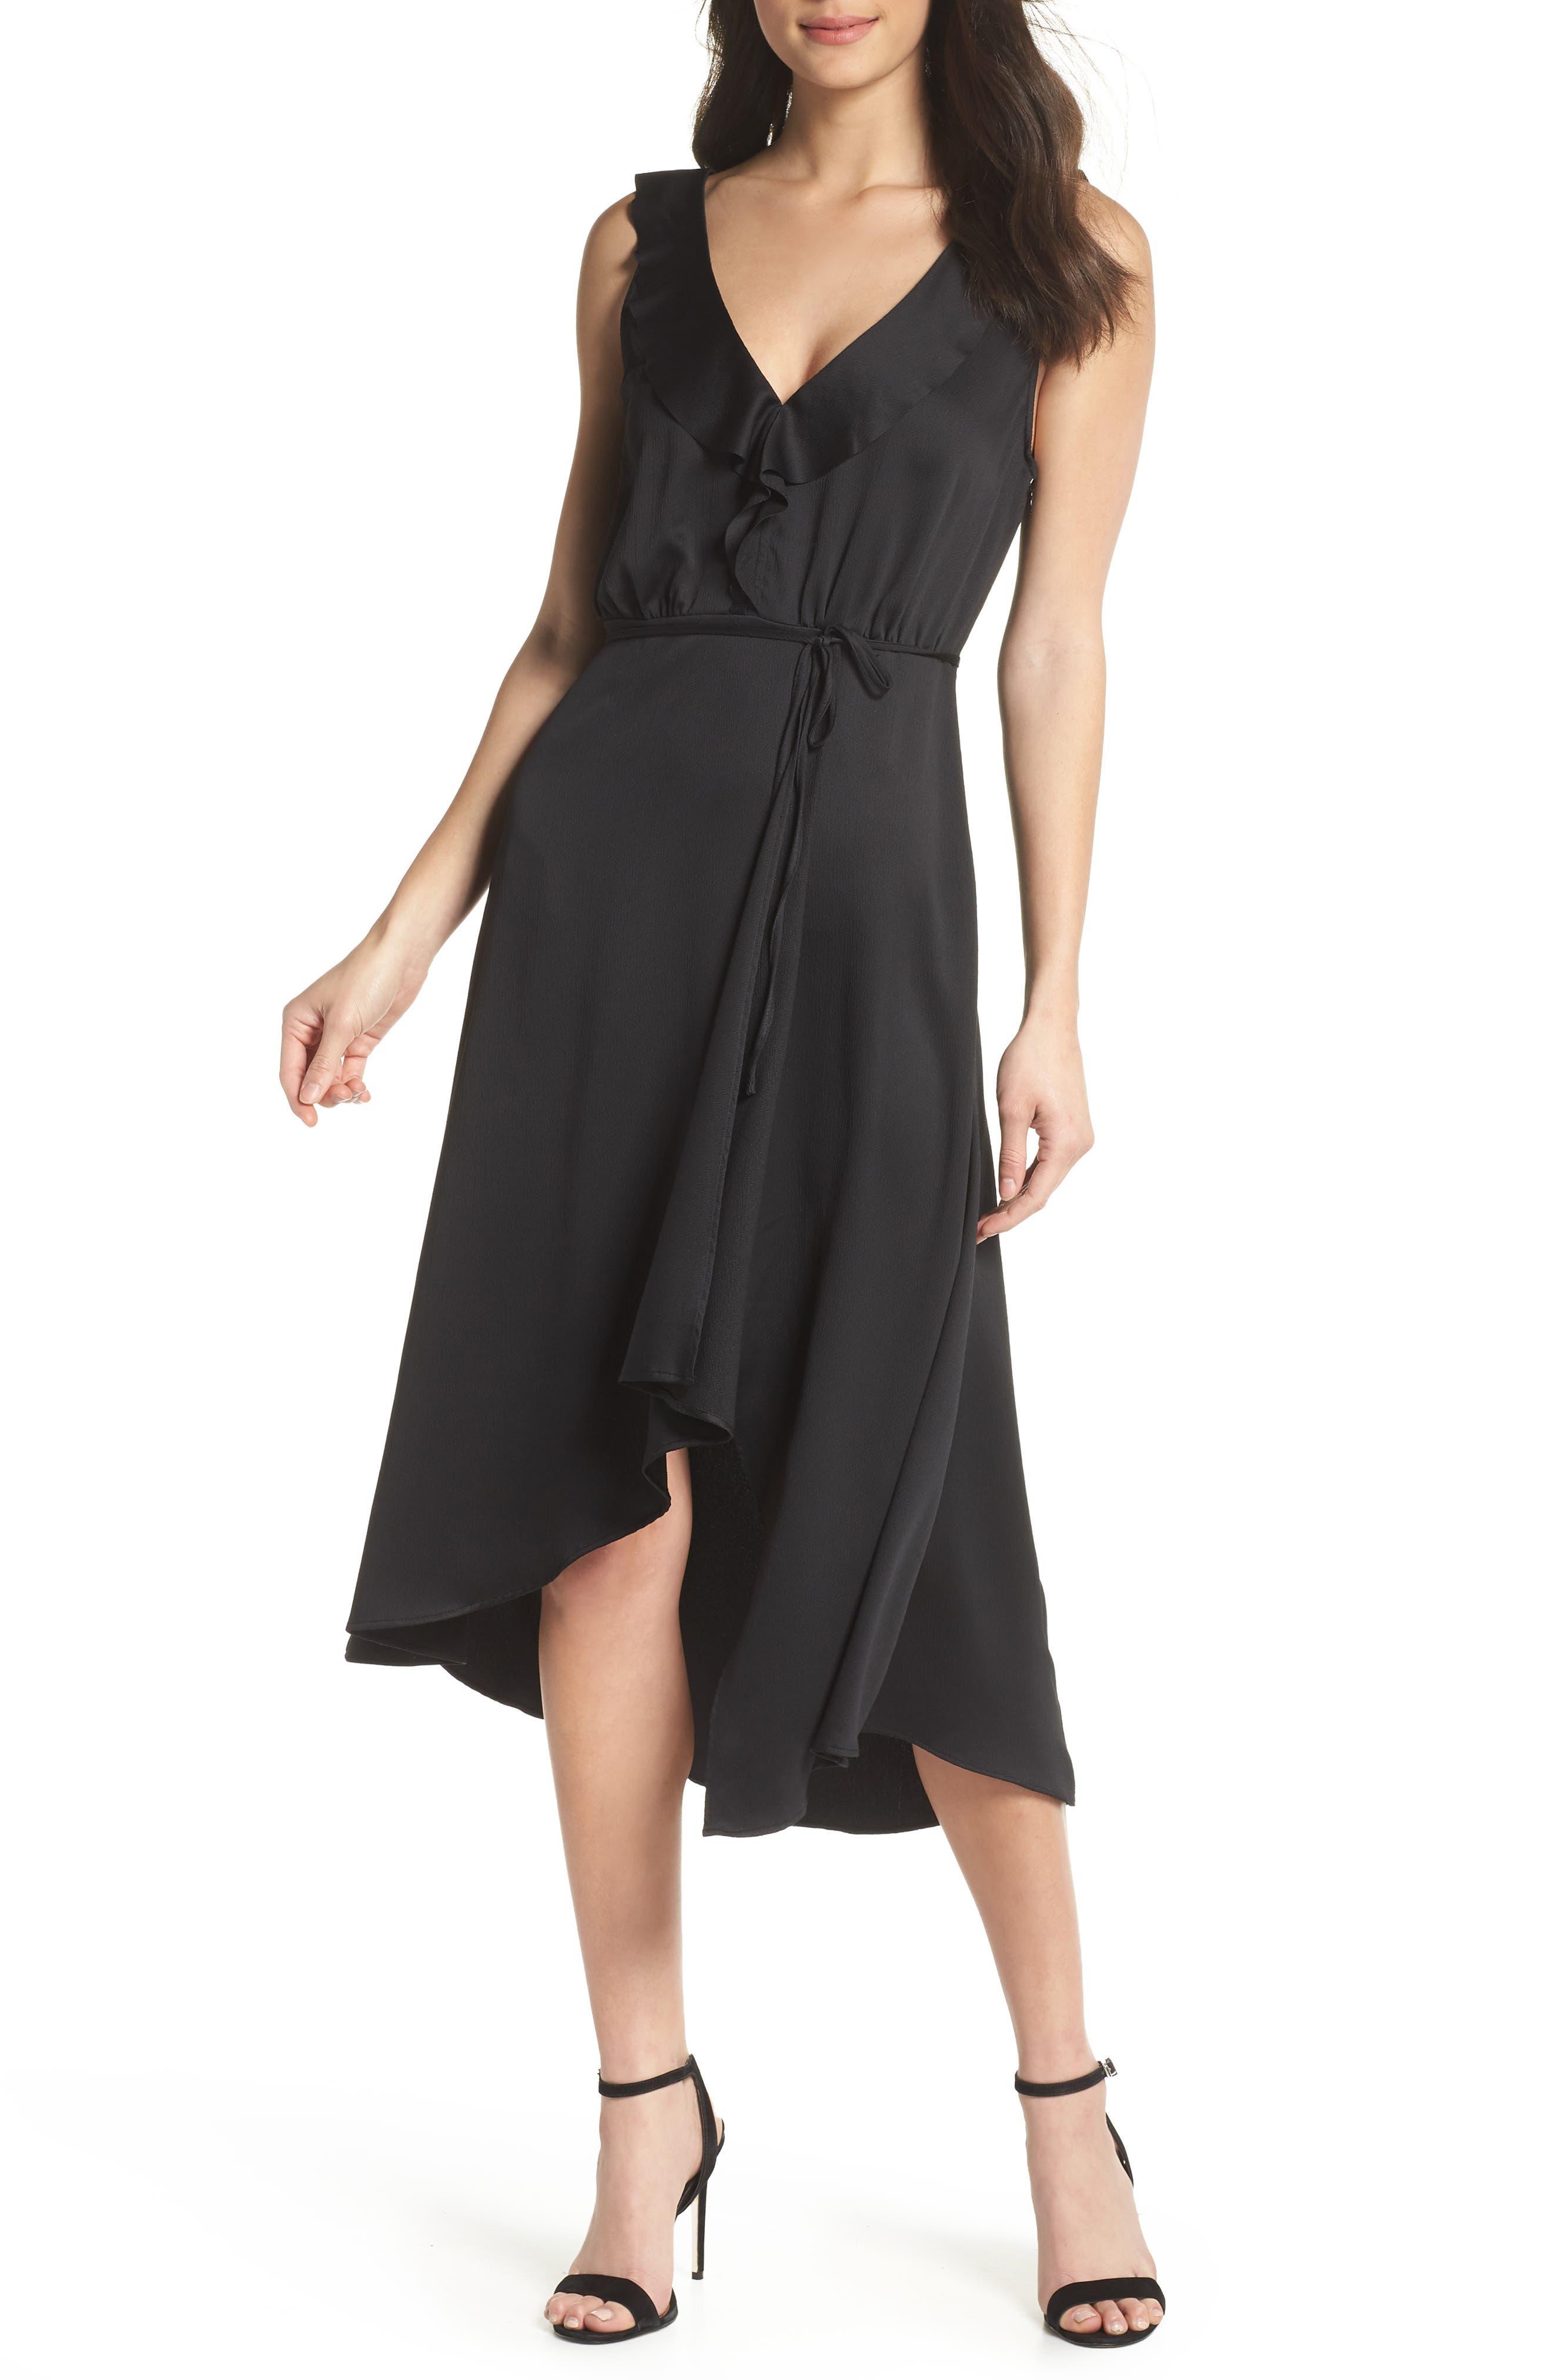 Maudie Ruffle Midi Dress,                             Main thumbnail 1, color,                             001